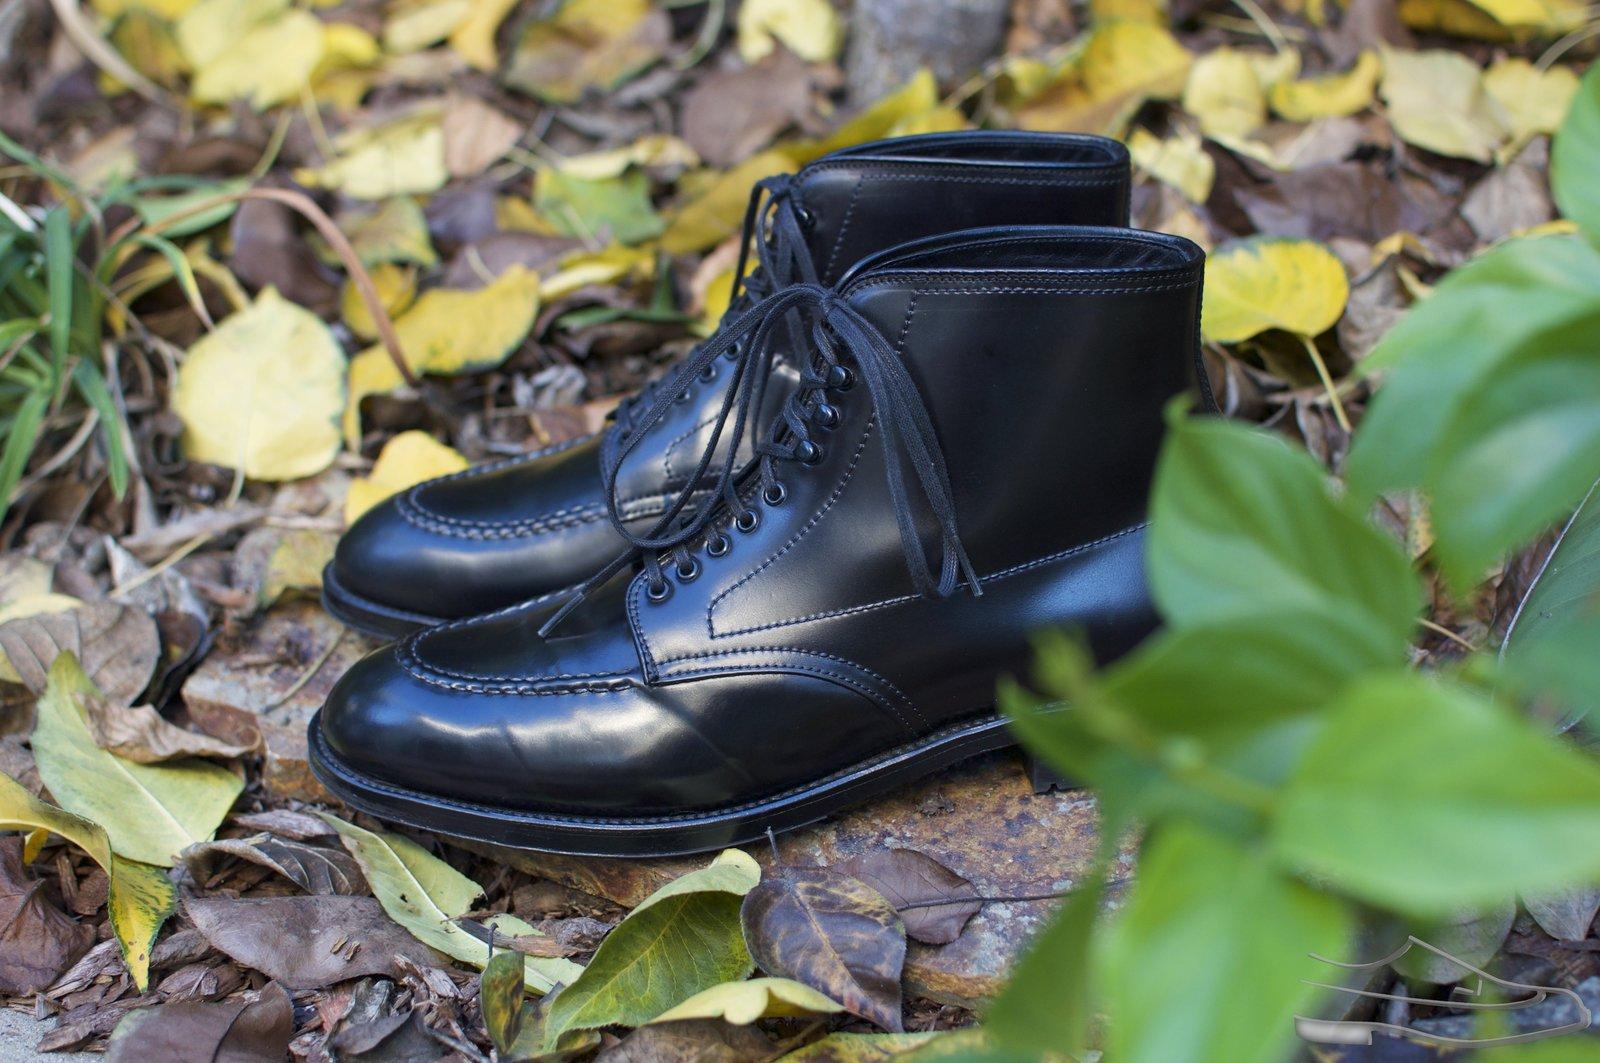 Alden Black Shell Cordovan U-Tip Boots - 2020-11-27 - 3.jpg